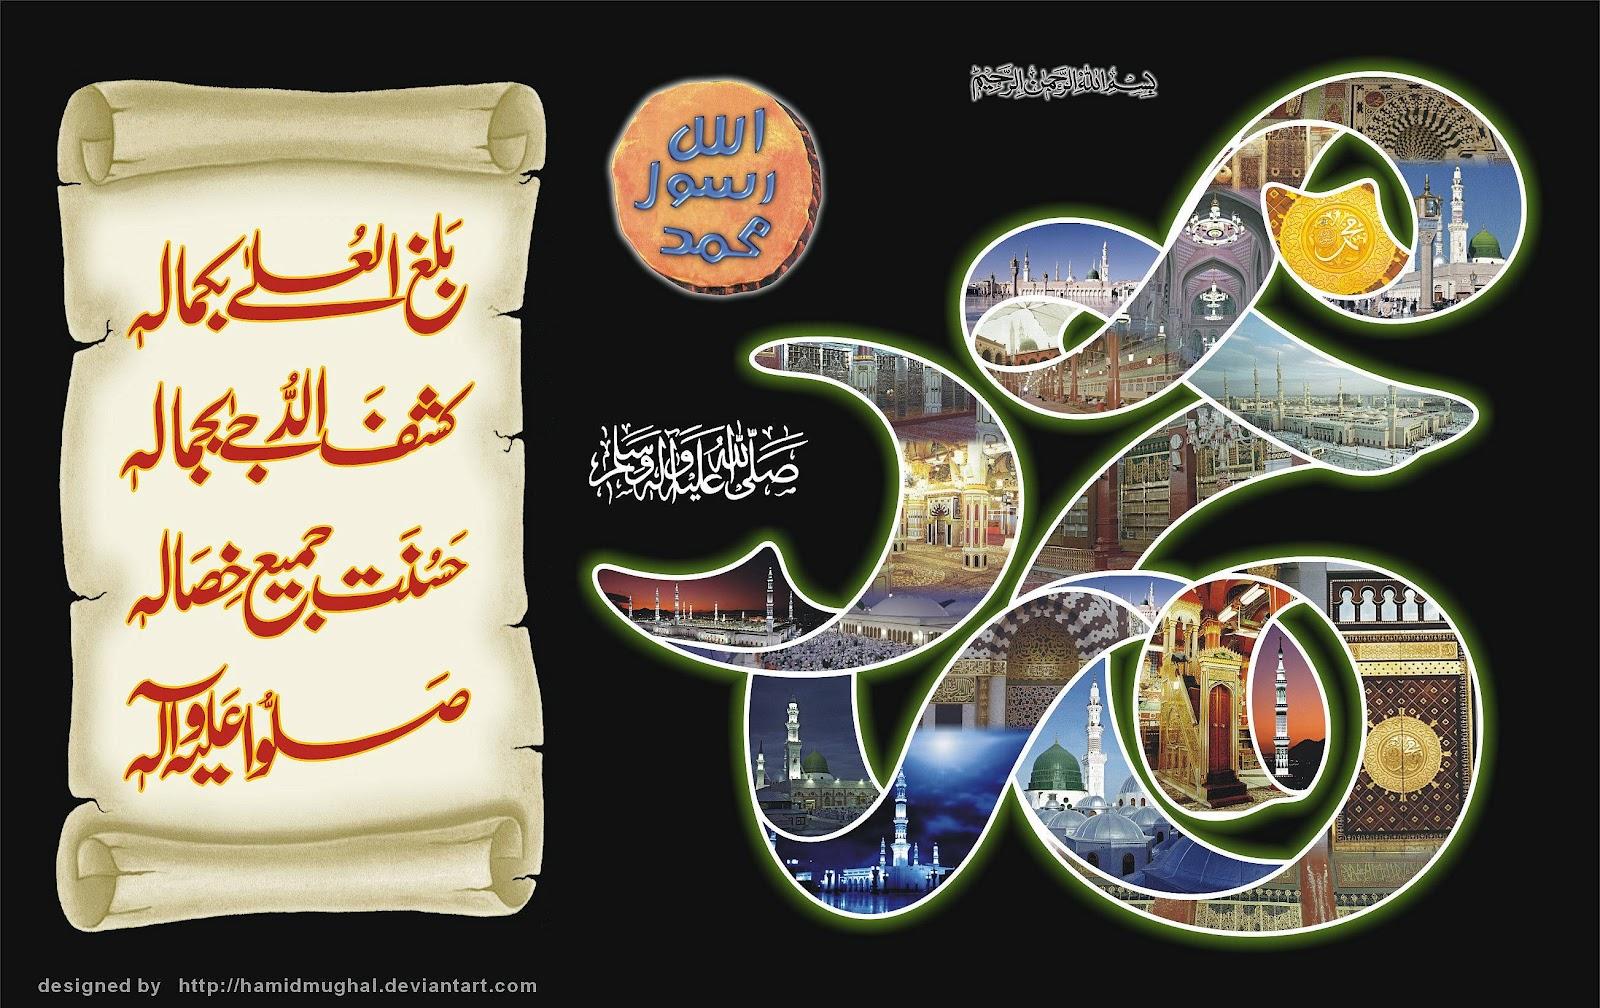 http://3.bp.blogspot.com/-sLHjl6P4ptQ/T2BfwFAmggI/AAAAAAAAAmo/HhvmTtl2W-c/s1600/Wallpaper+Muhammad+Rasulullah.jpg